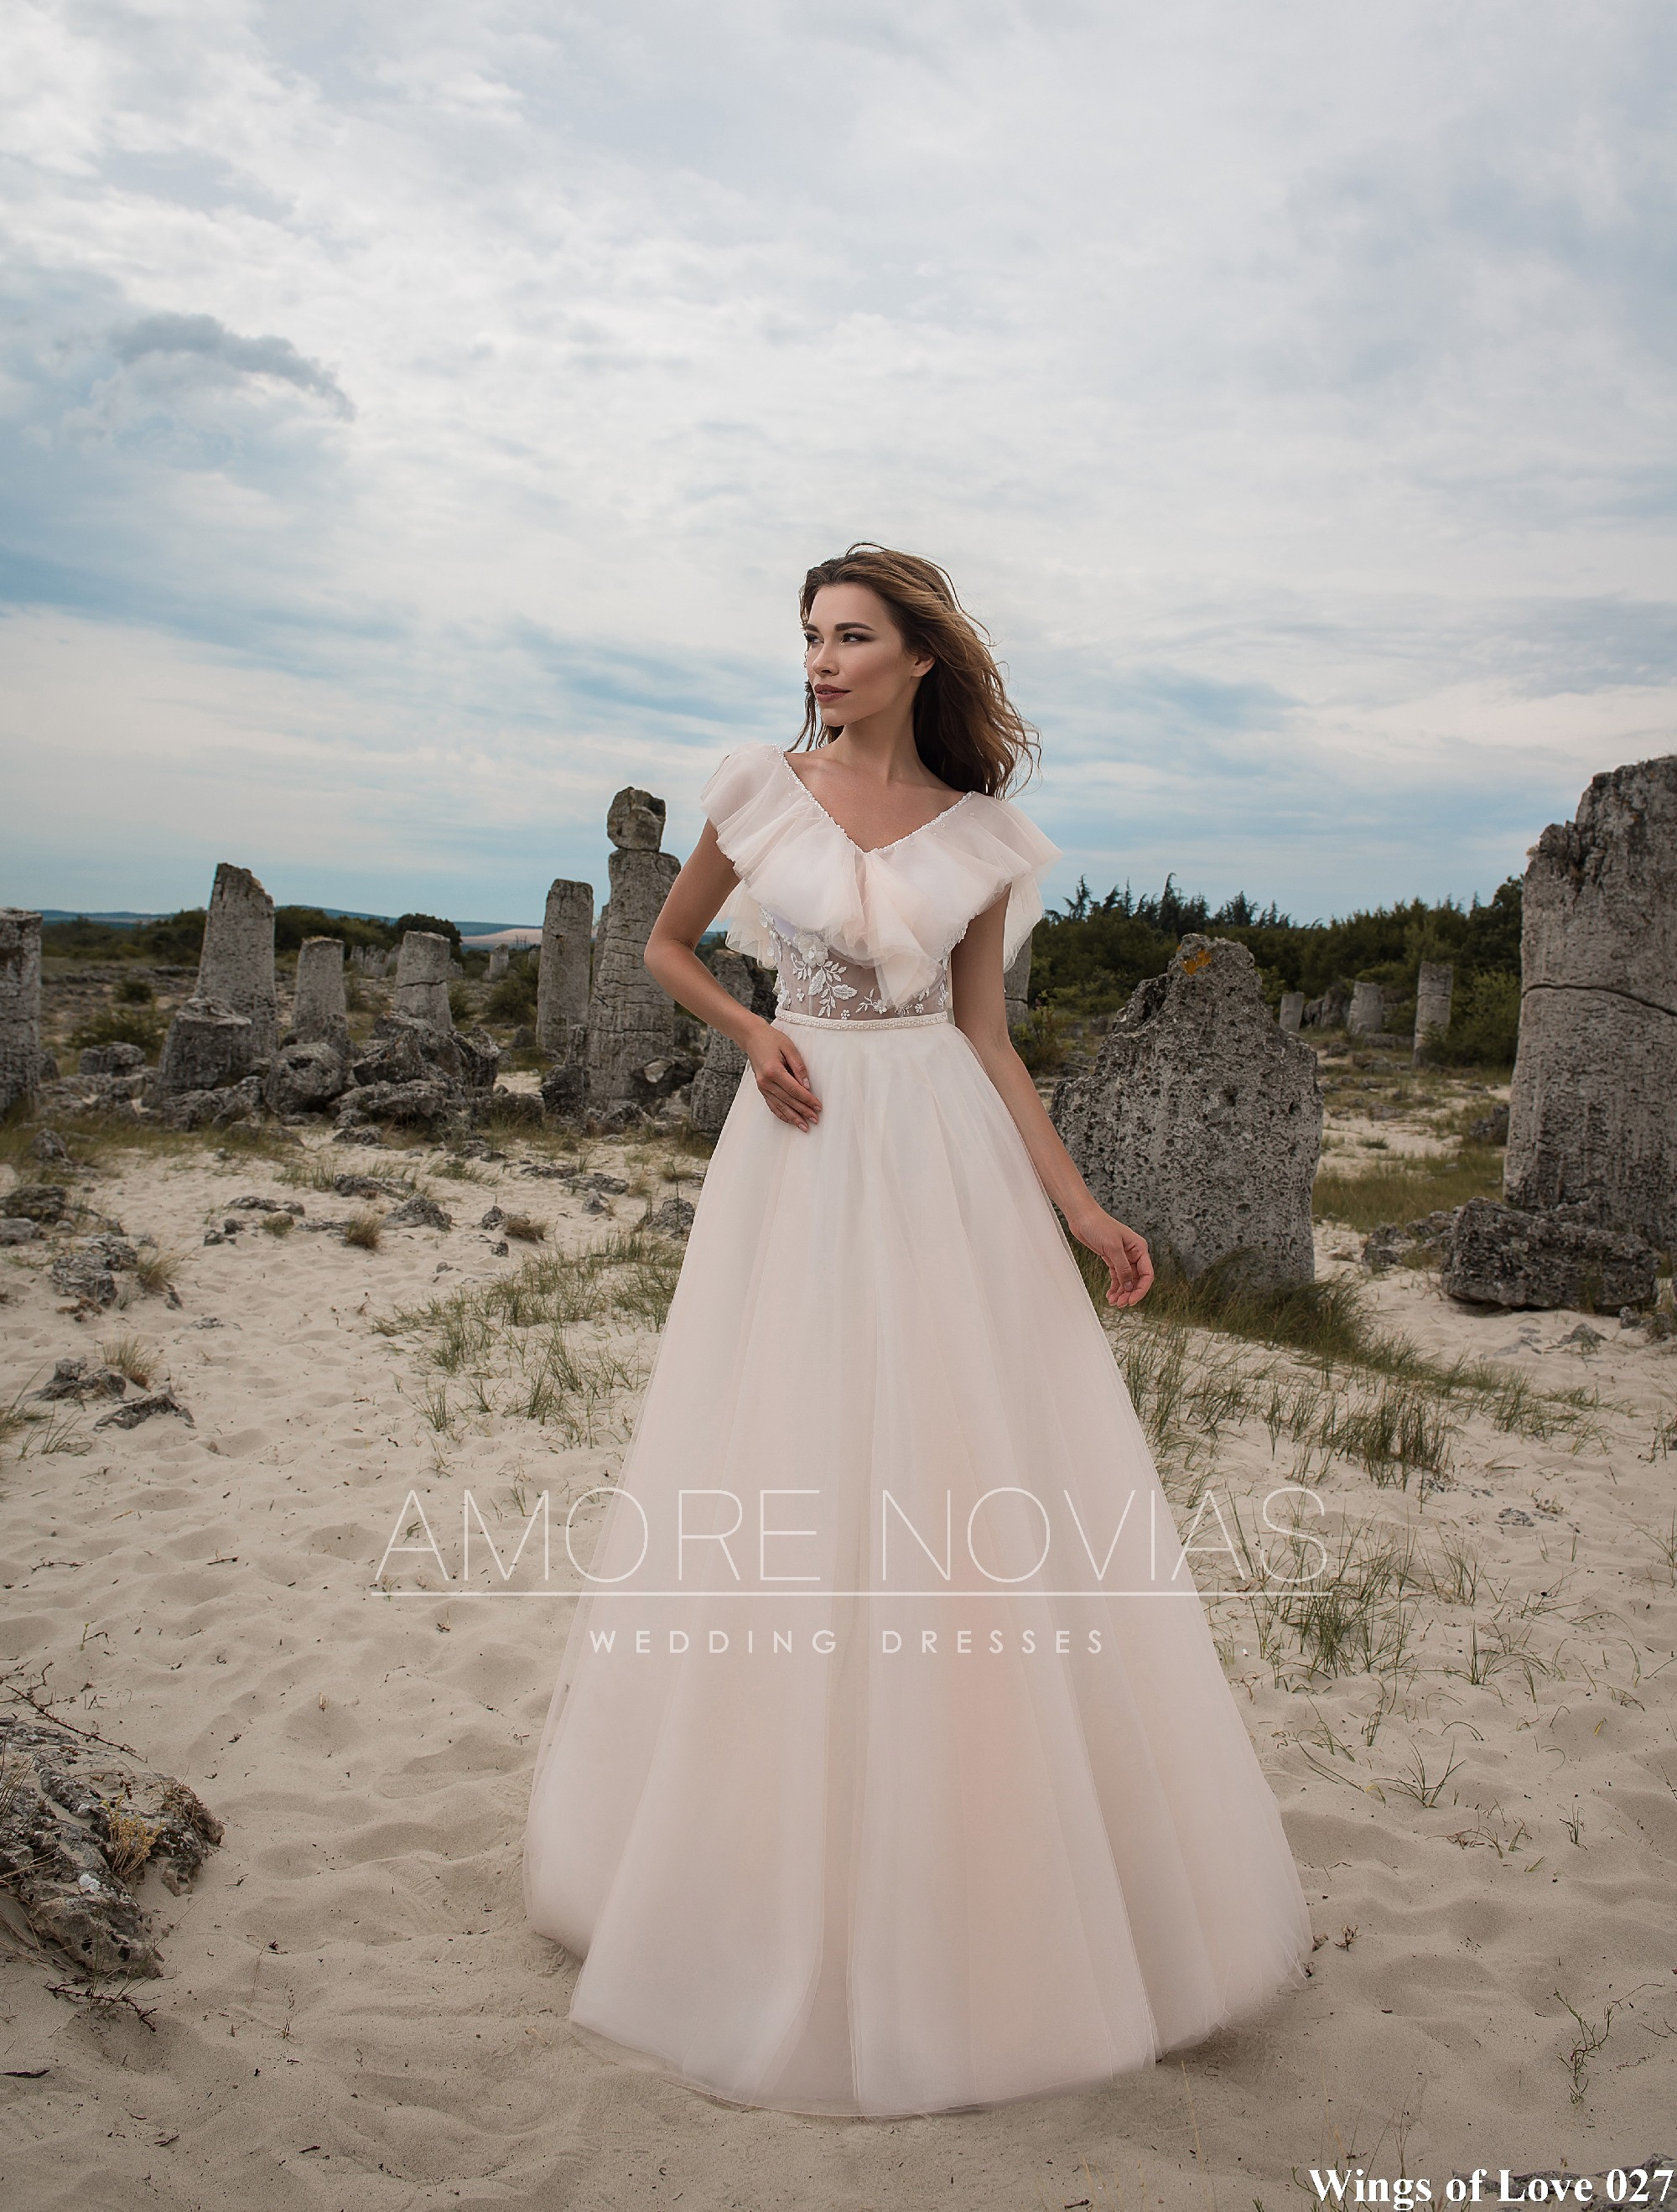 https://amore-novias.com/images/stories/virtuemart/product/lk-027-------(1).jpg